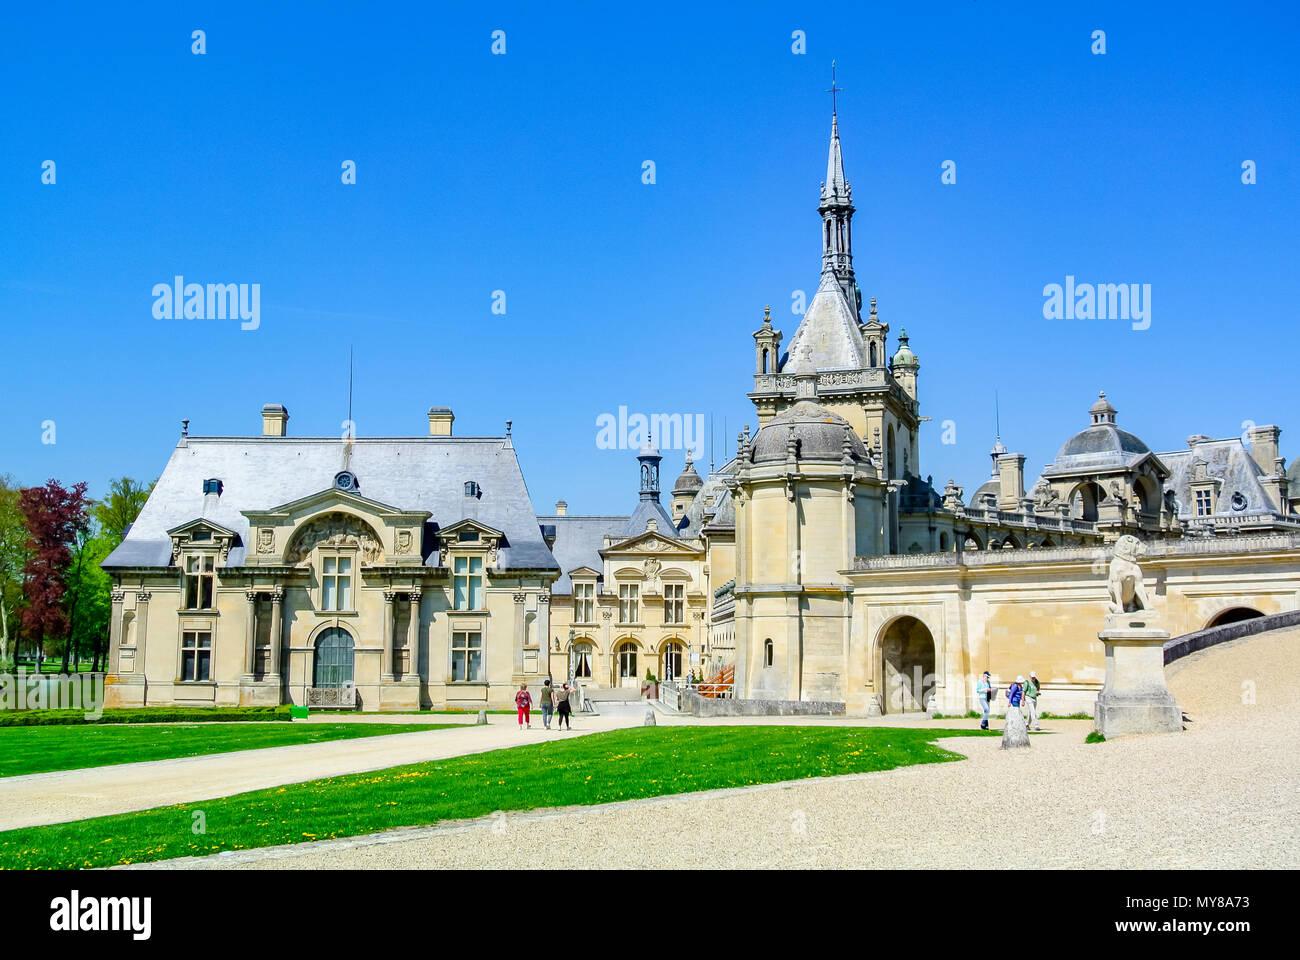 Chantilly Castle (Chateau de Chantilly), Oise, France - Stock Image